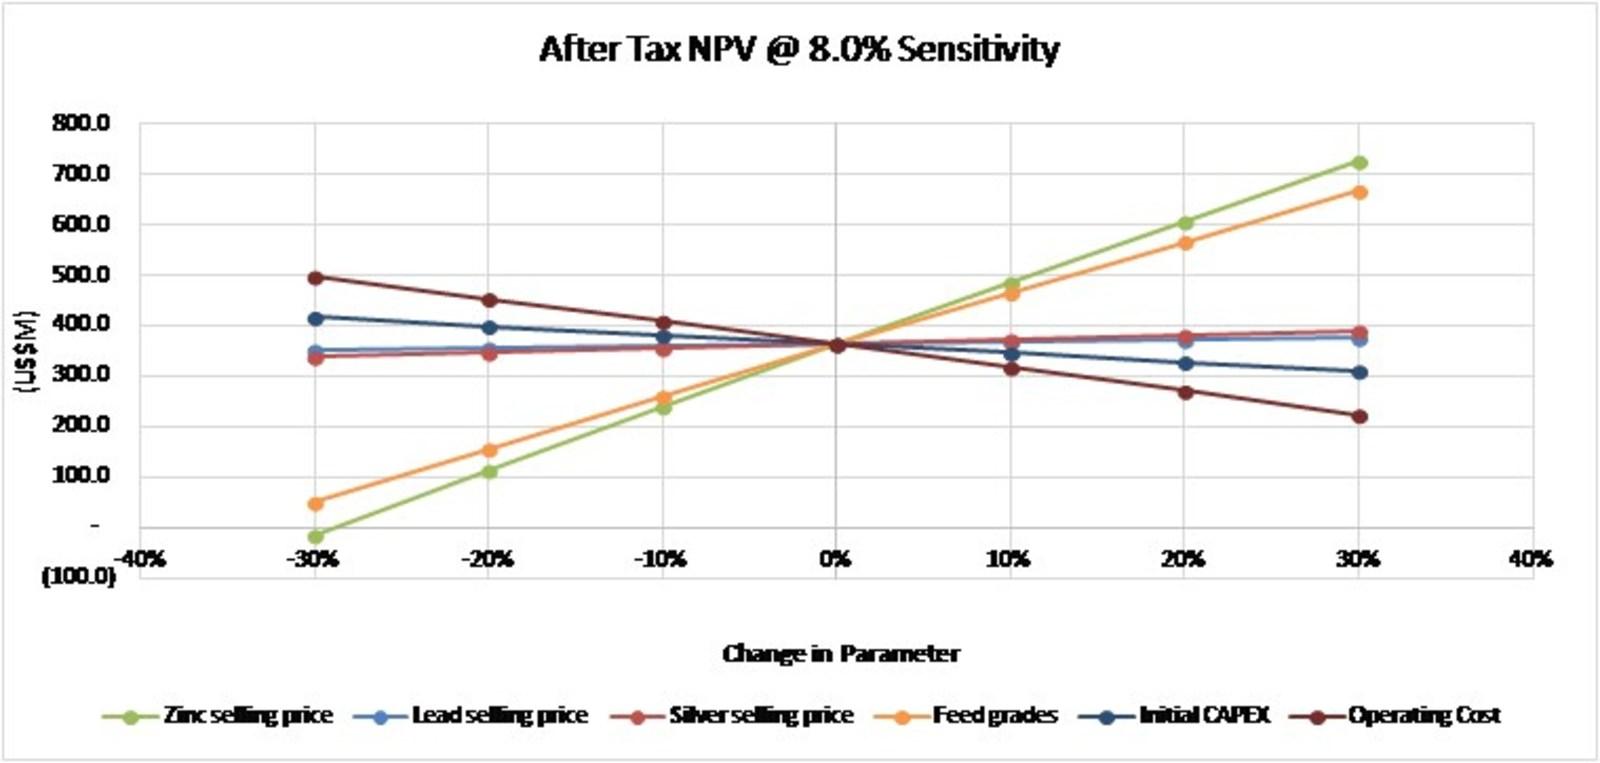 After Tax NPV @ 8.0% Sensitivity